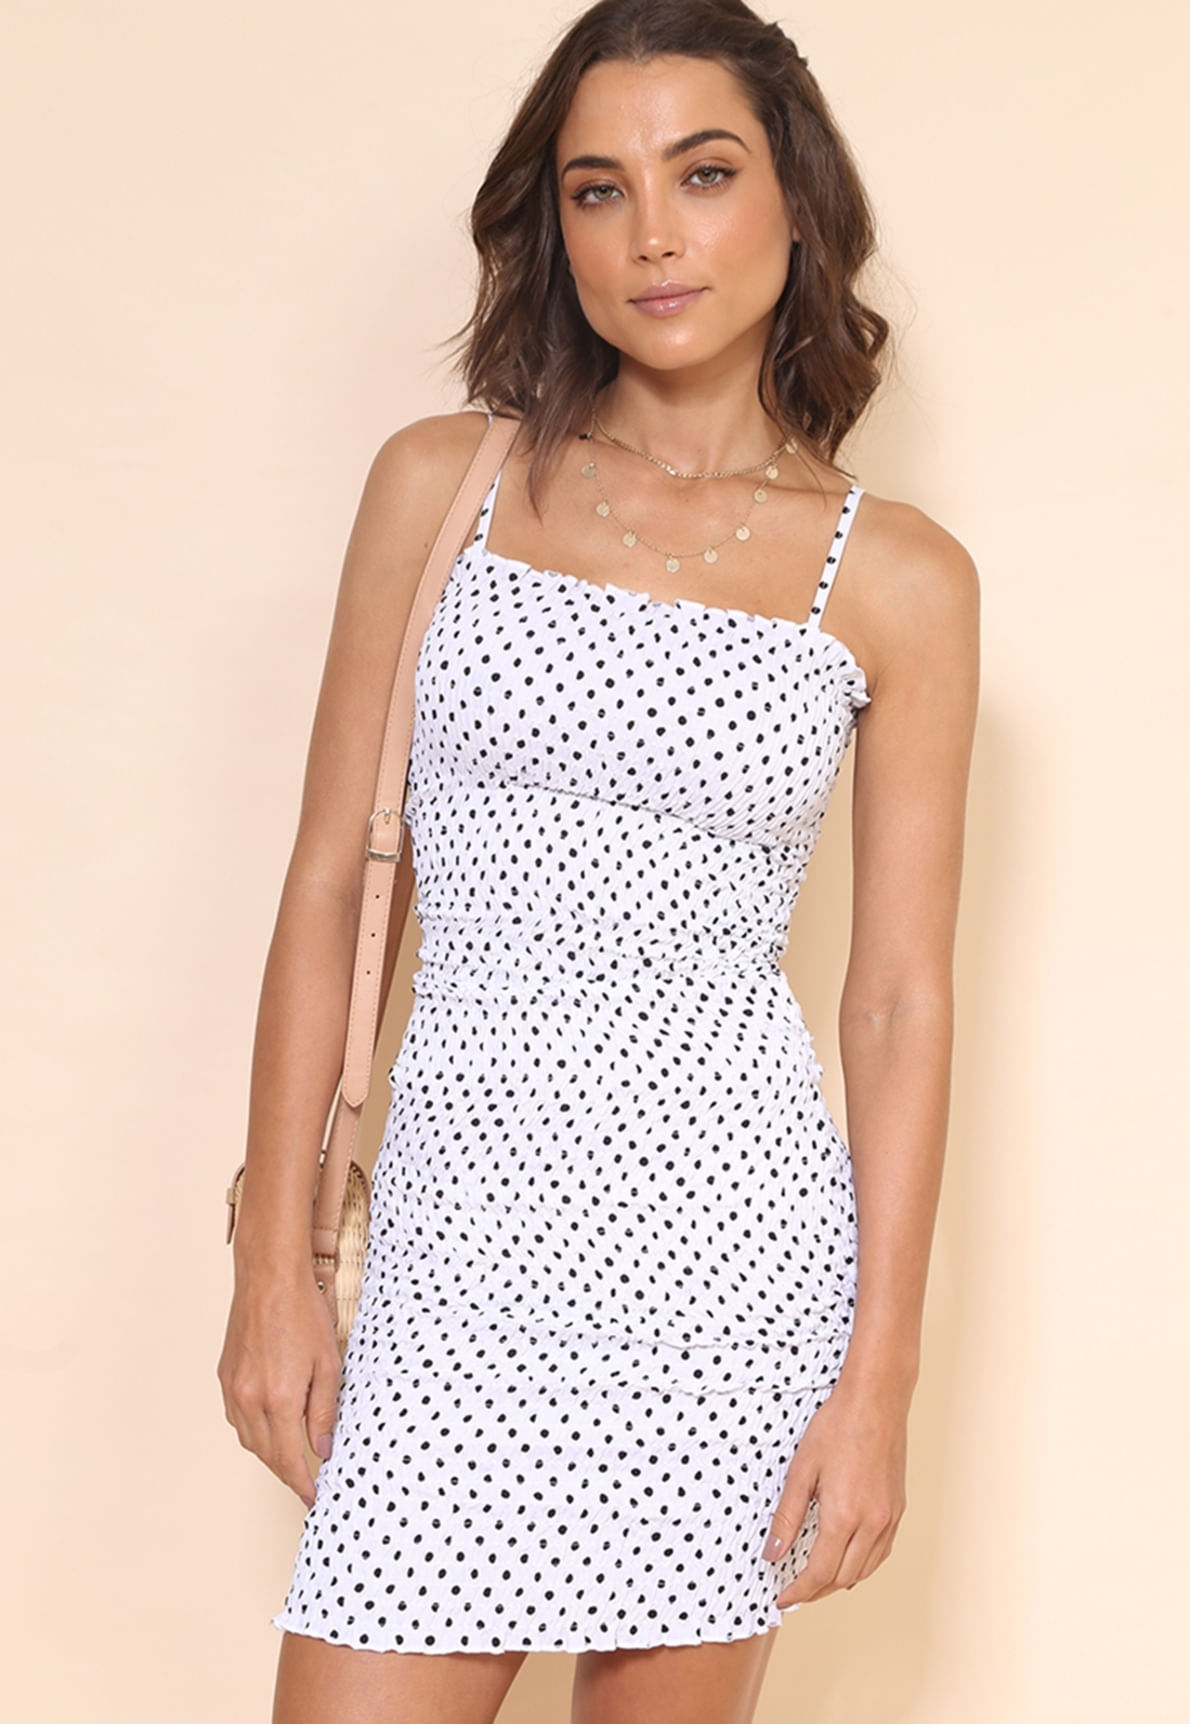 21706-vestido-lastex-poa-branco-bruna-mundo-lolita-03